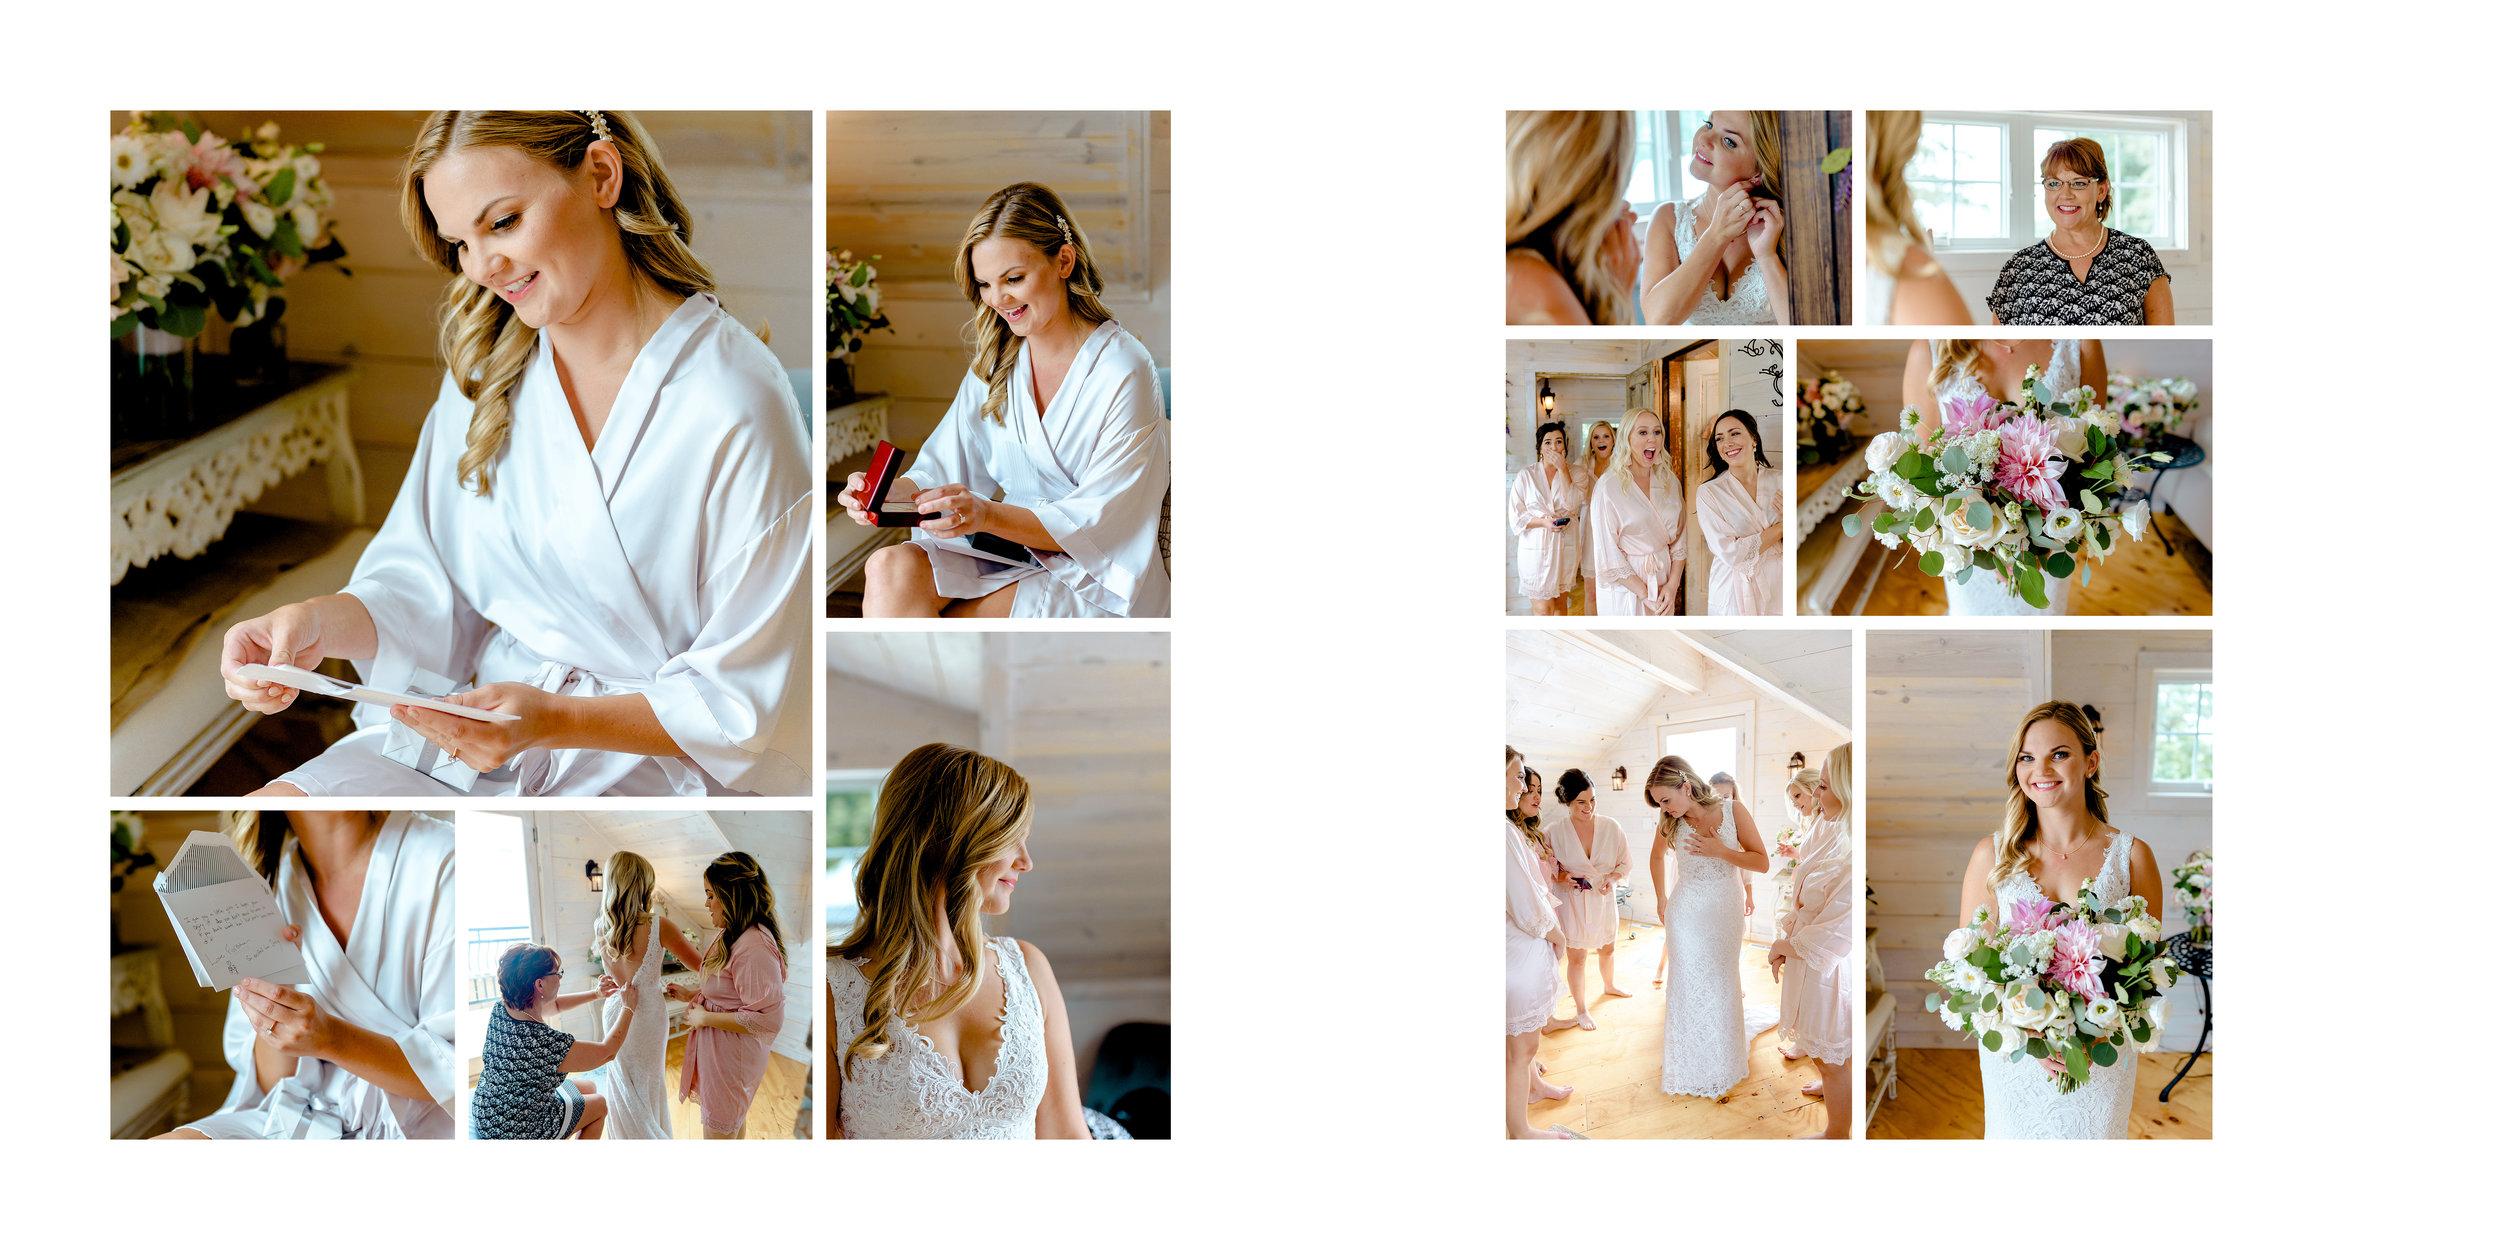 Ashley + Justin - Wedding Album_06.jpg